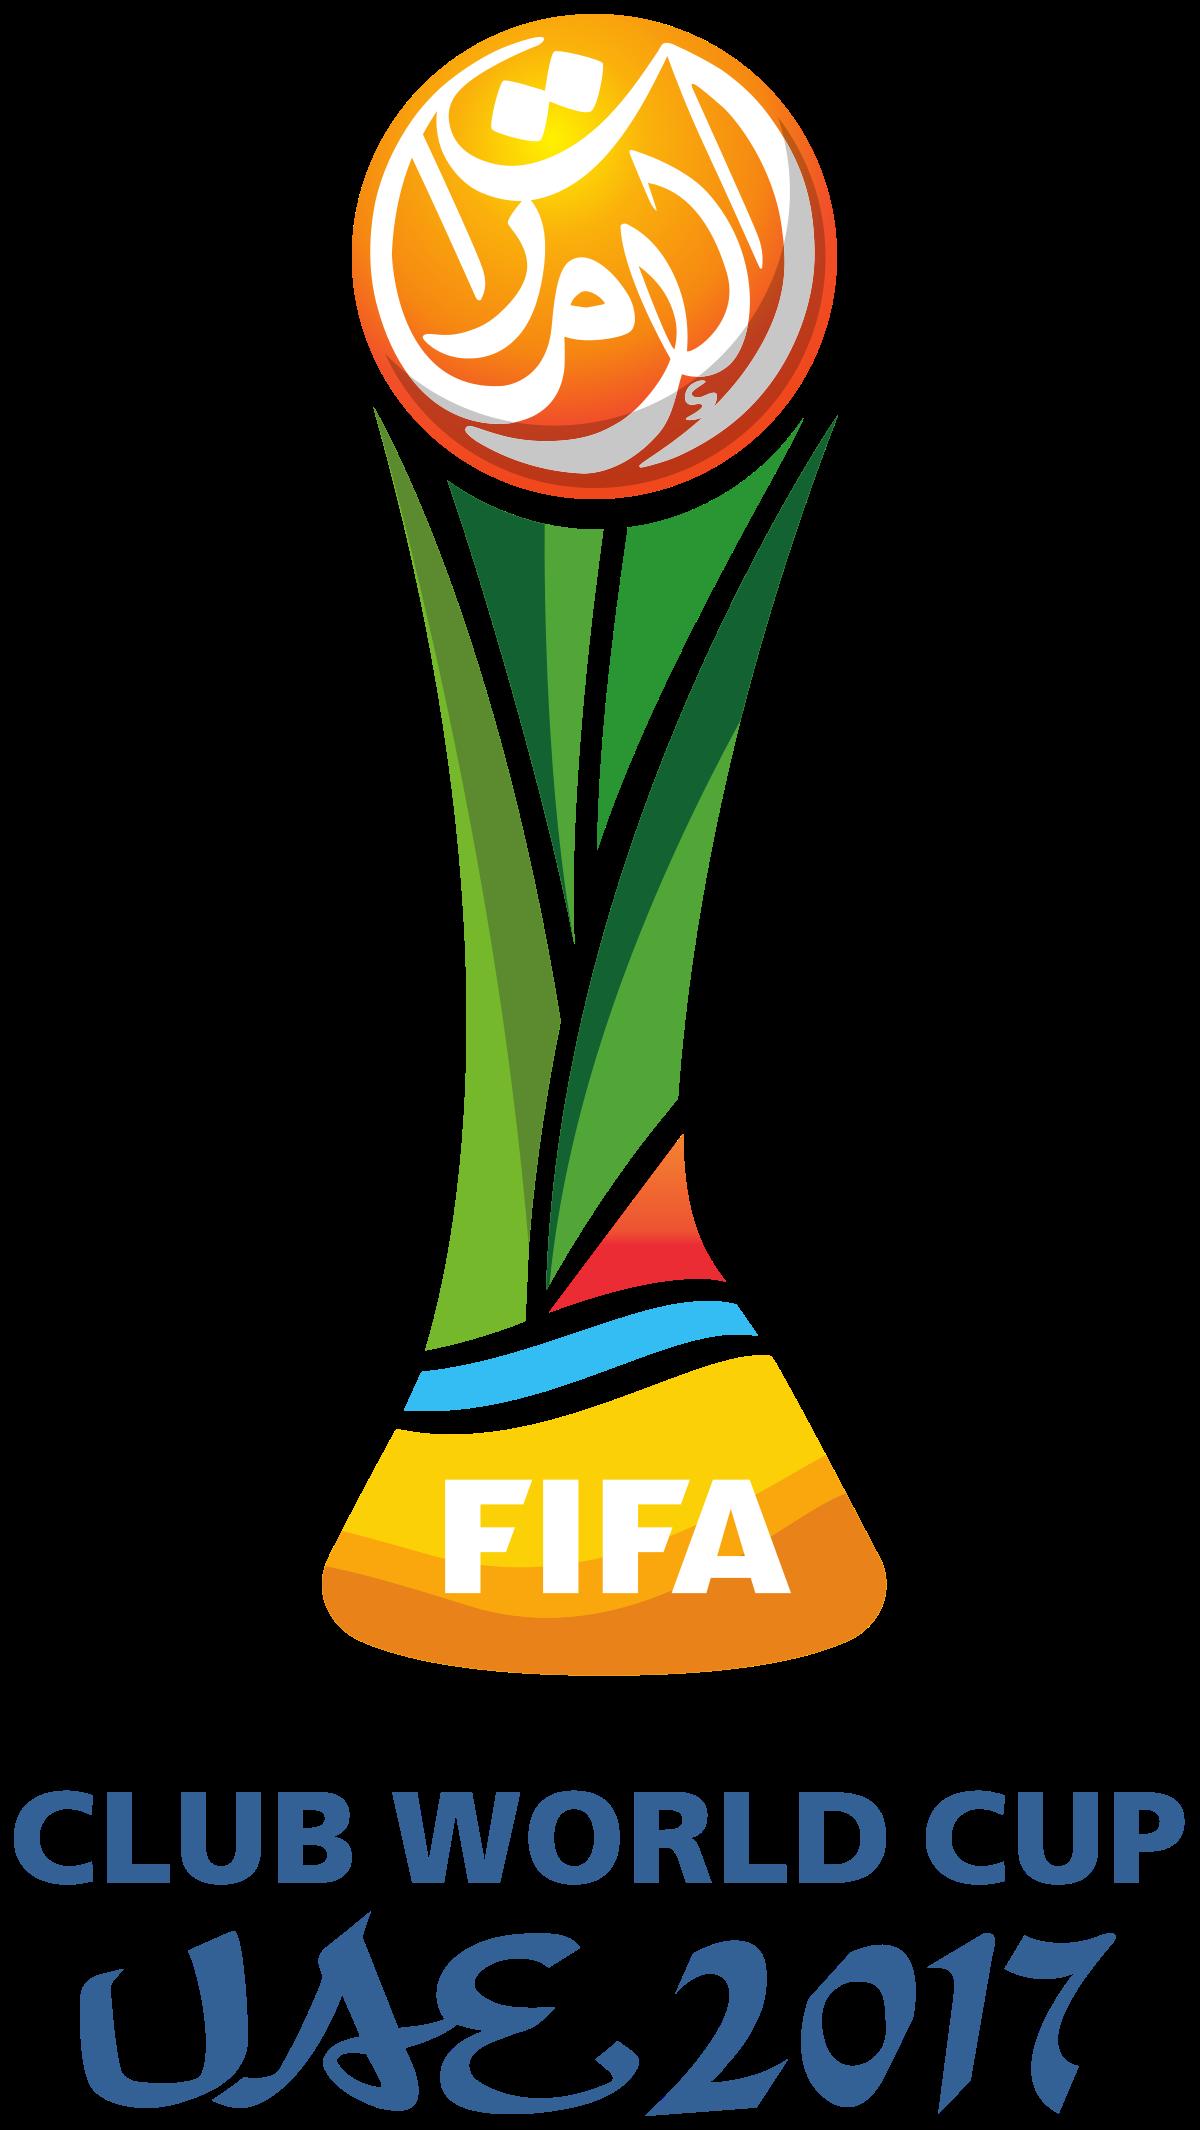 Logo Fifa World Cup 2018 PNG-PlusPNG Pluspng.com-1200 - Logo Fifa World - Fifa World Cup 2018 Vector PNG